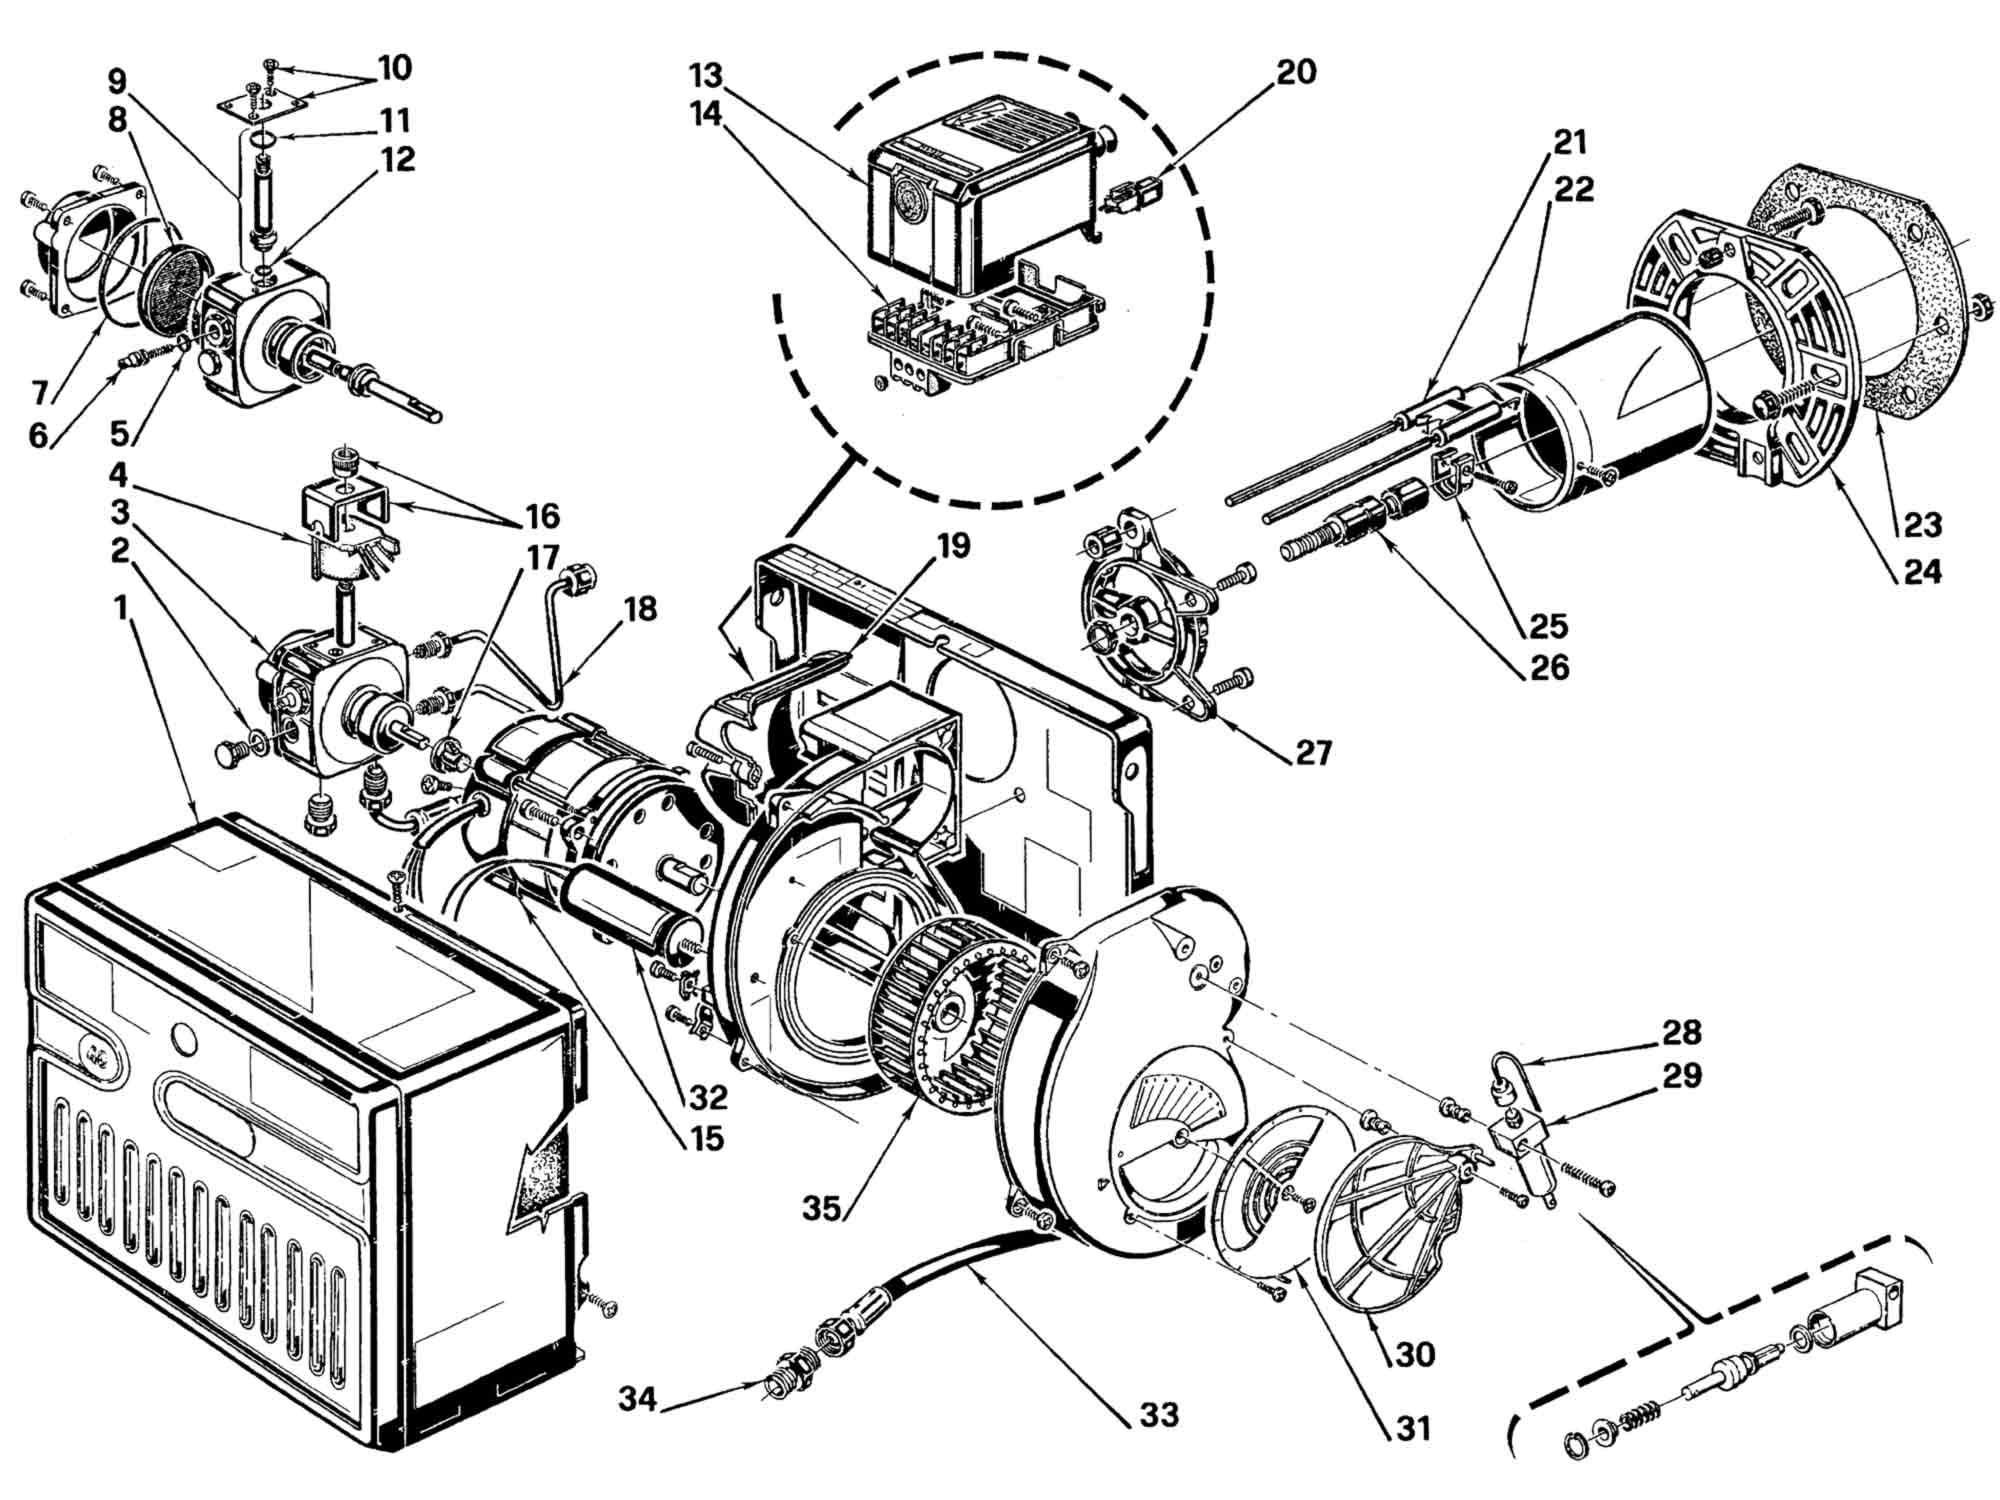 Gibson G3 Wiring Diagram